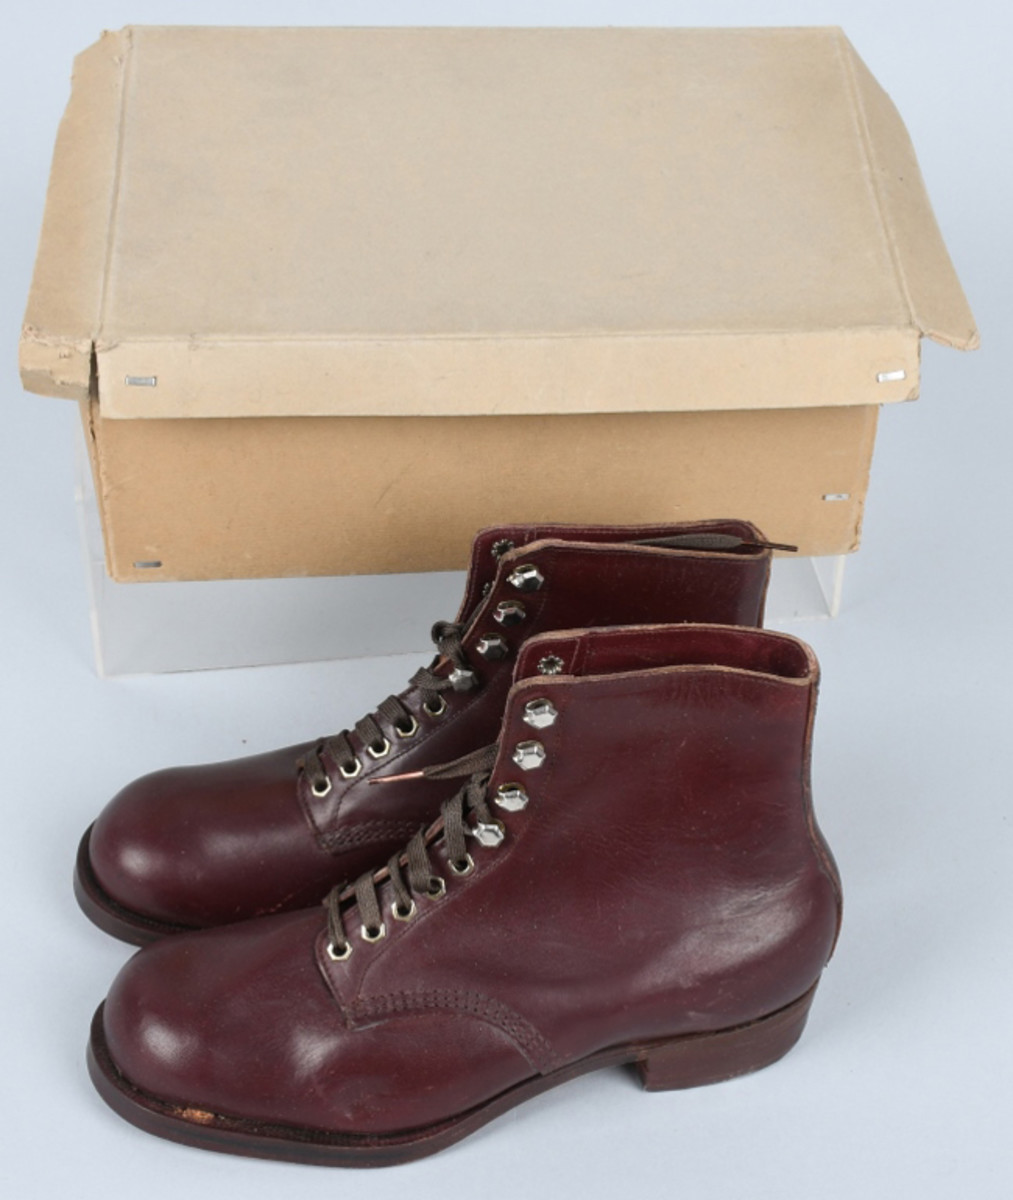 https://www.liveauctioneers.com/item/61938279_wwii-nazi-german-hitler-youth-shoes-original-boxWorld War II Nazi German Hitler Youth shoes, mint and unused in original box, $1,170